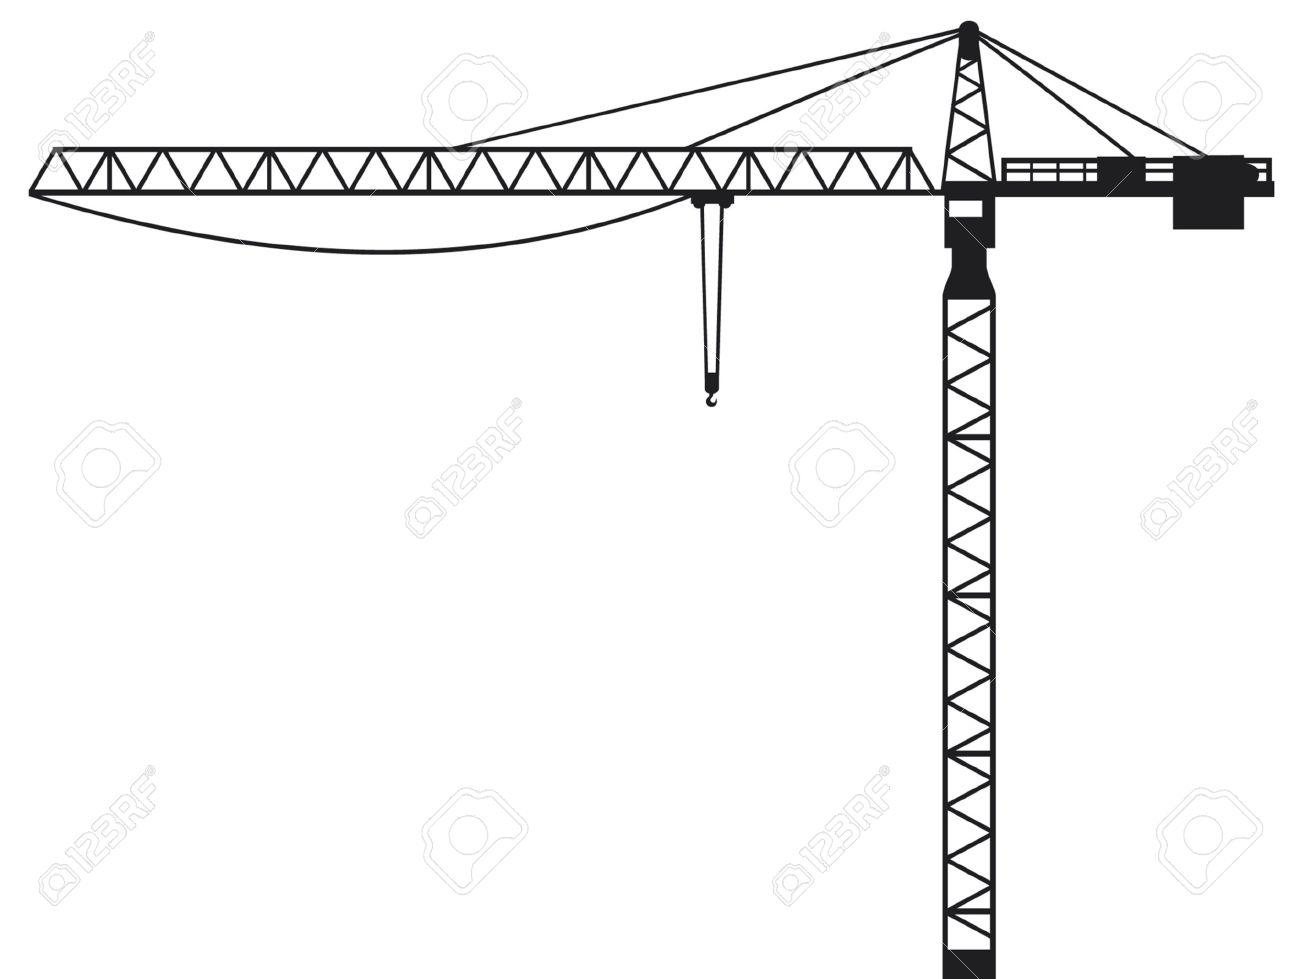 Construction Cranes Clipart